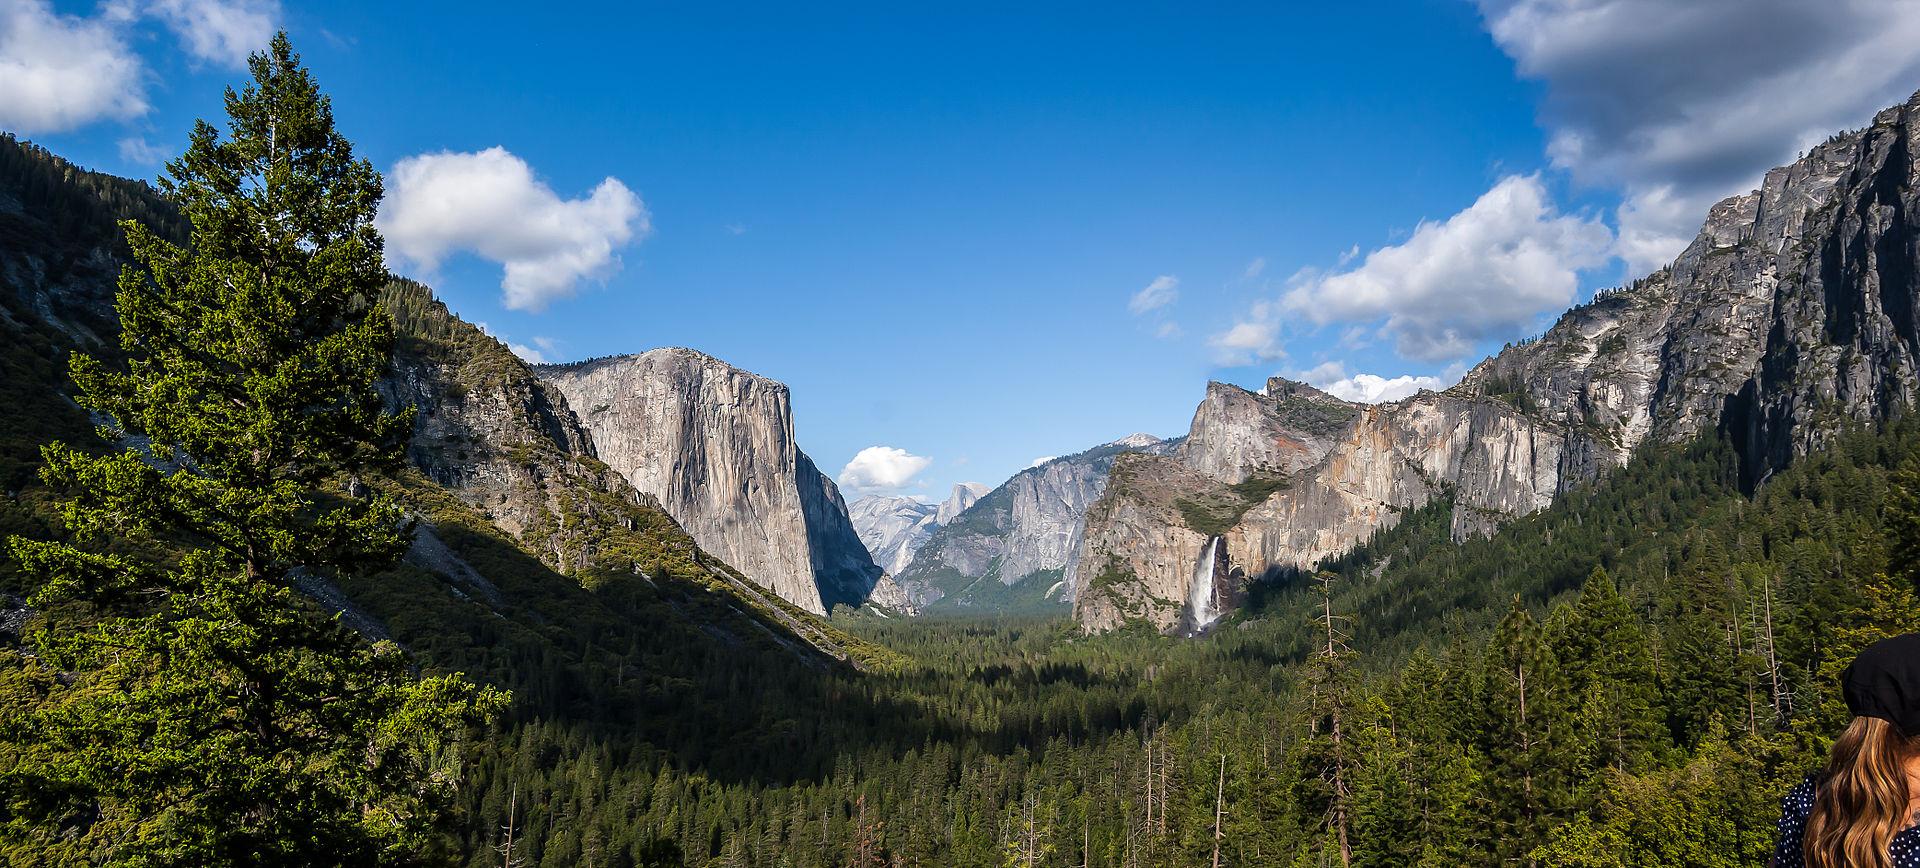 Yosemite Valley from Tunnel View.jpg